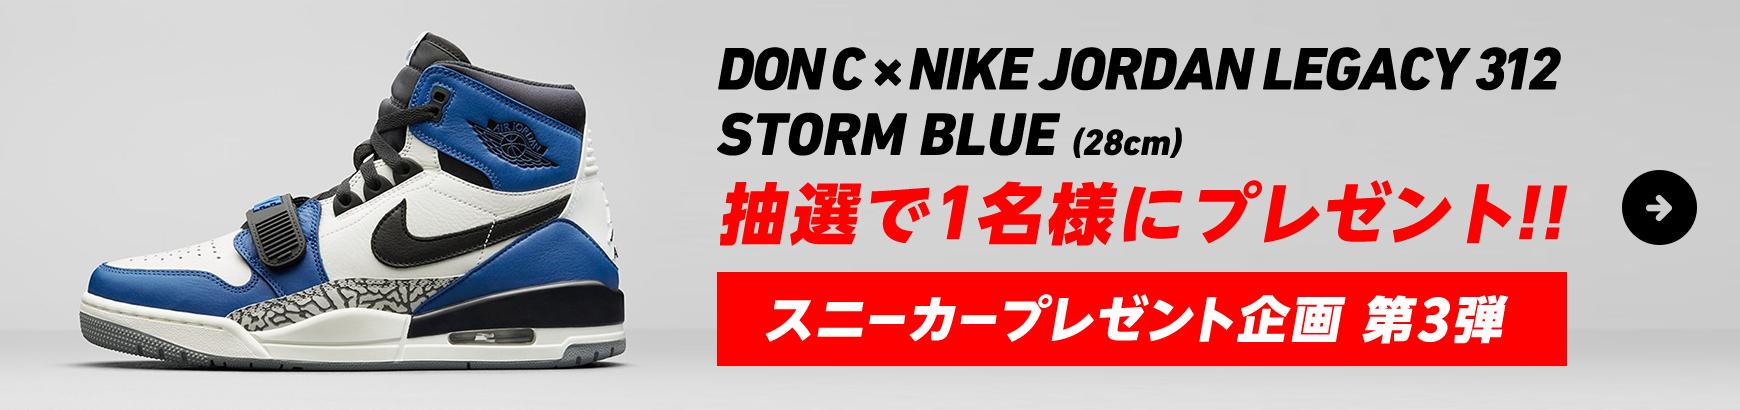 DON C × NIKE JORDAN LEGACY 312 STORM BLUEを抽選で一名様にプレゼント!